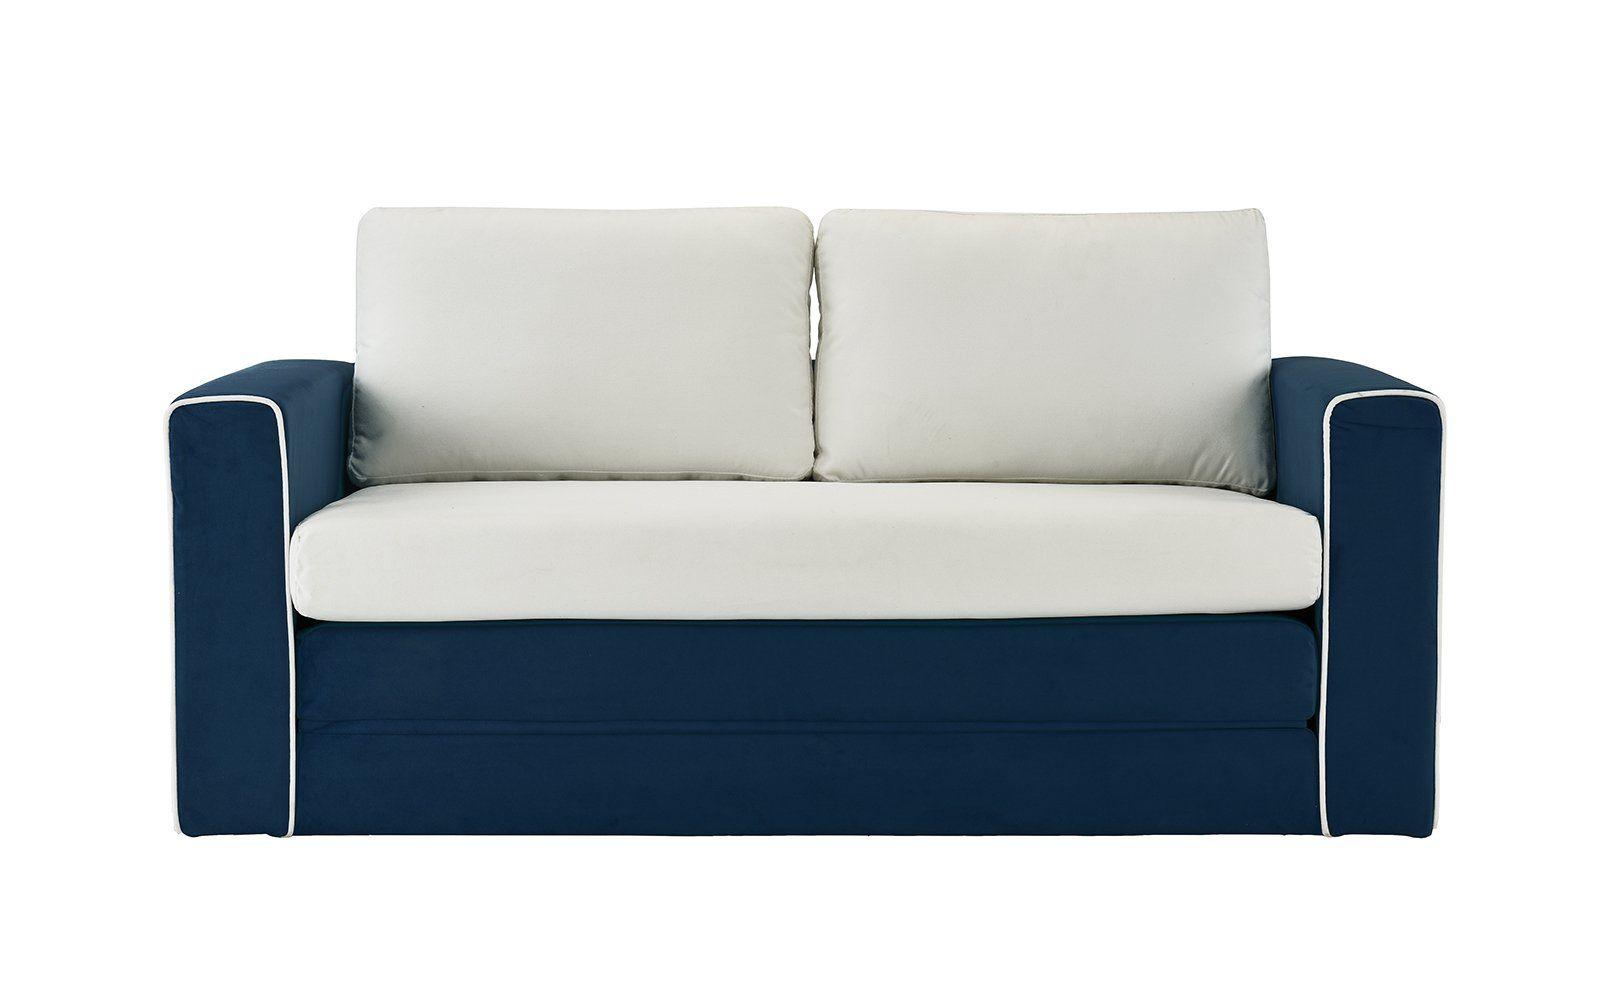 Dru 2 Tone Modular Sleeper Sofa